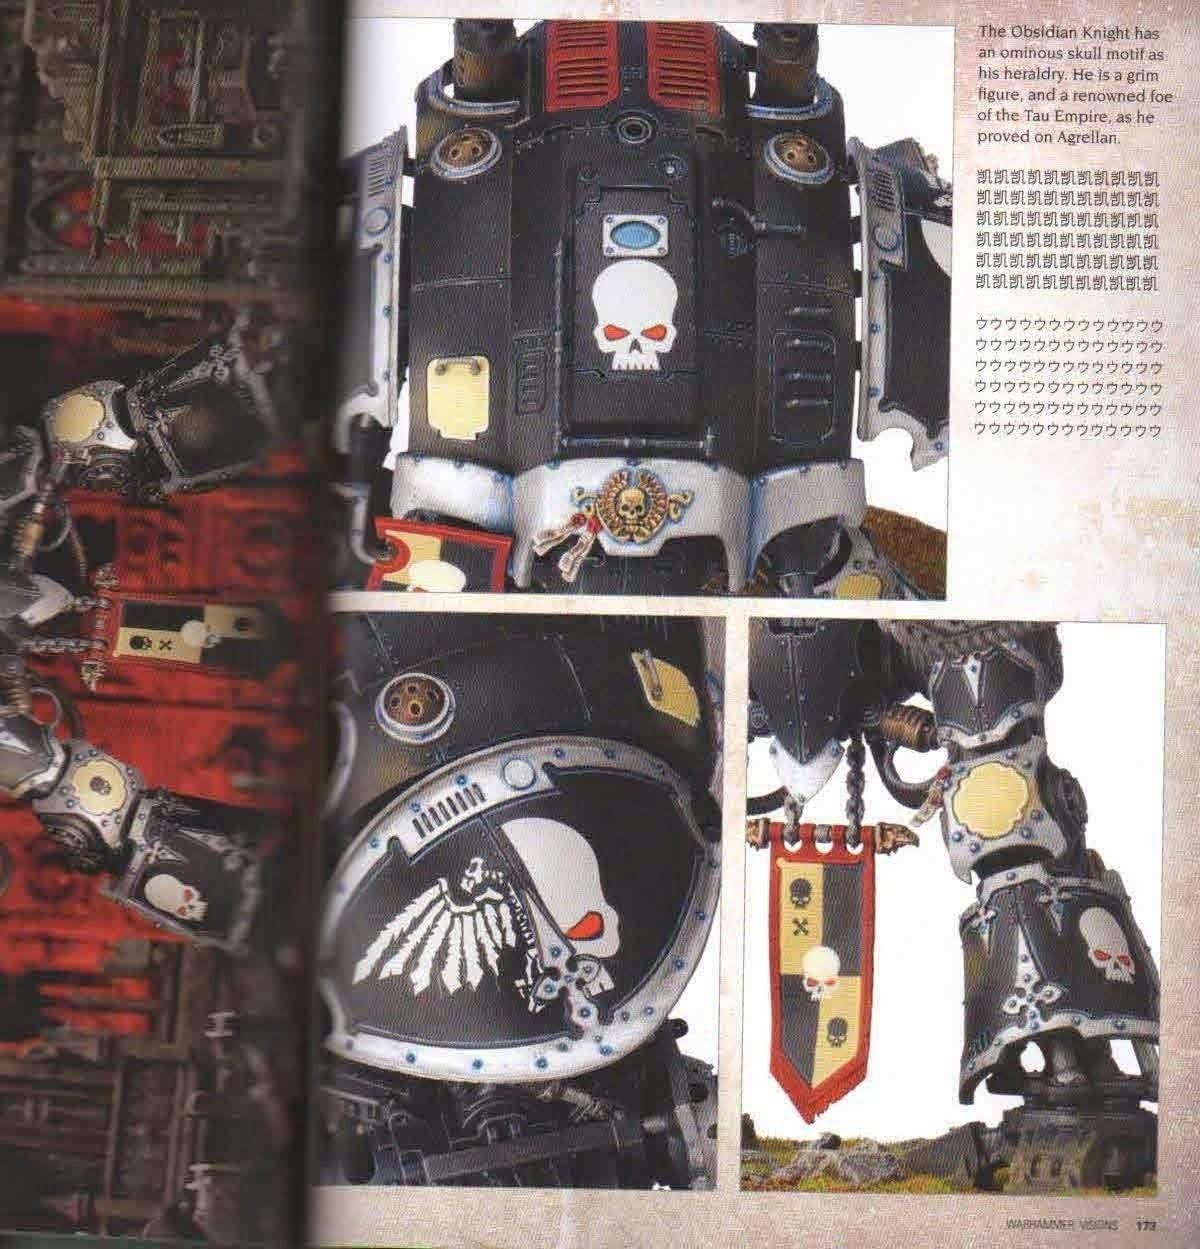 Errores Warhammer: Visions, número 3, página 173